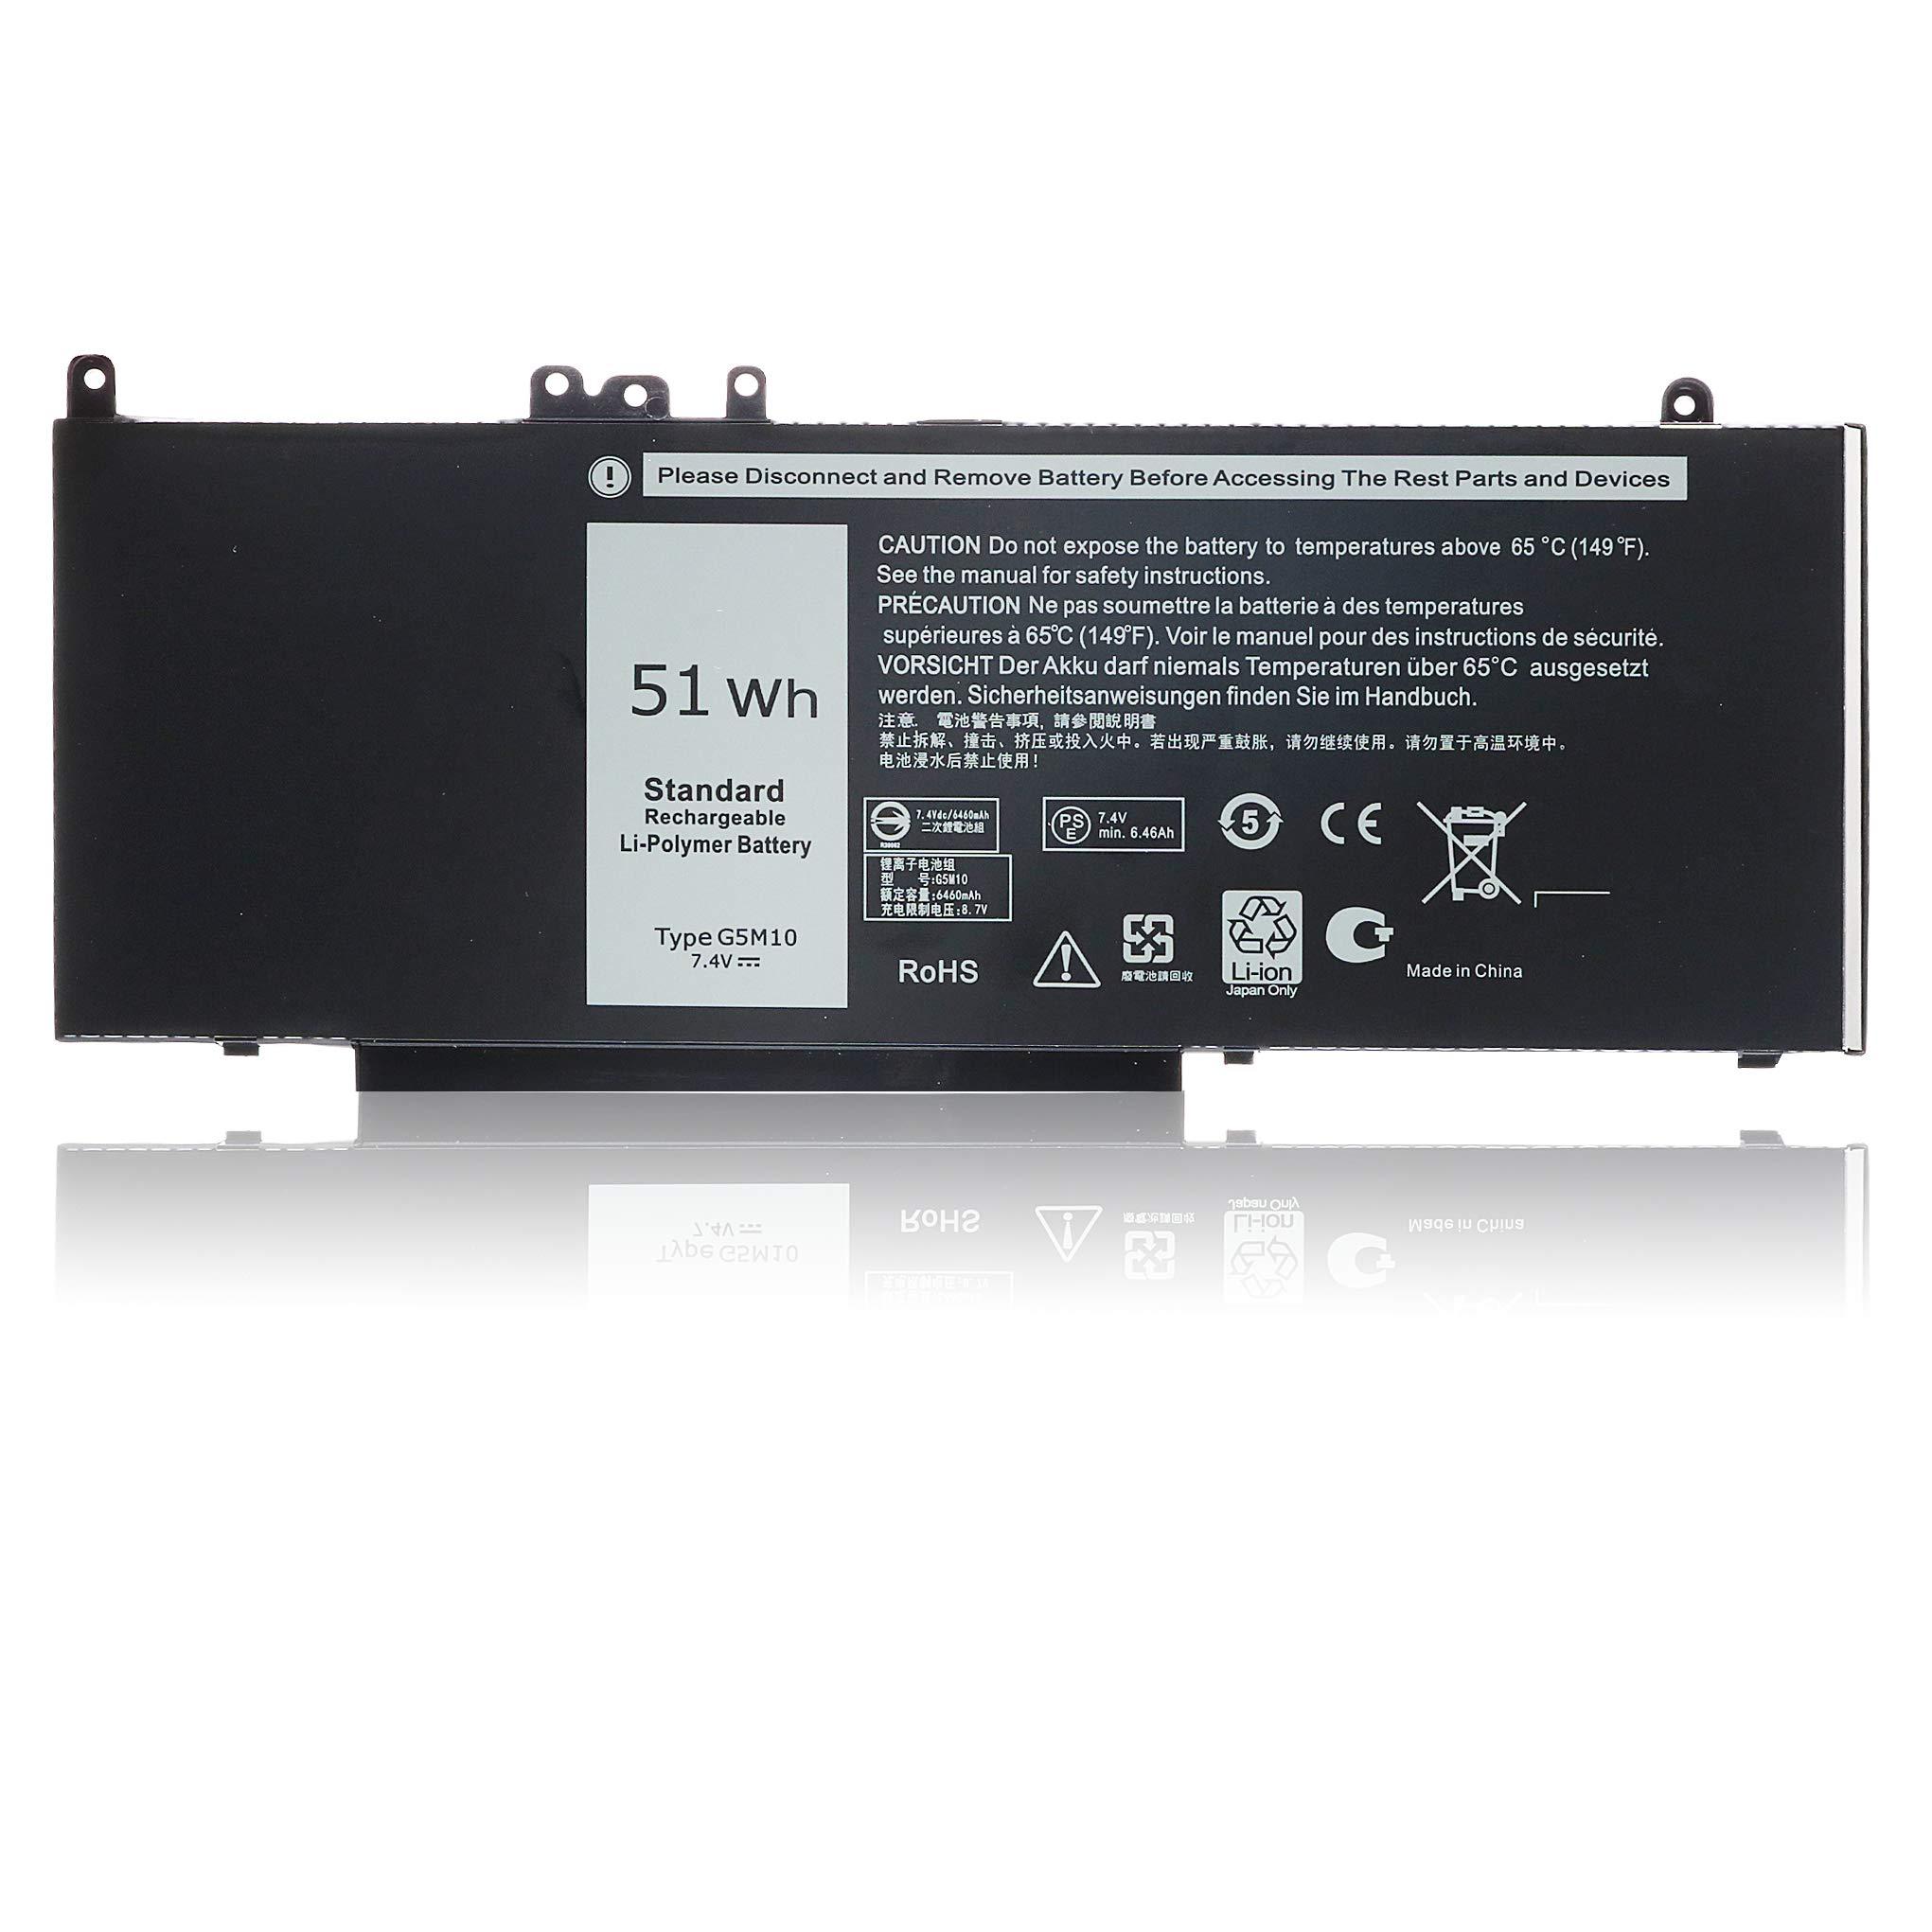 Bateria G5M10 para Dell Latitude E5450 E5550 E5570 Type 7V69Y 6MT4T 8V5GX 79VRK TXF9M WYJC2 0WYJC2 08V5GX -